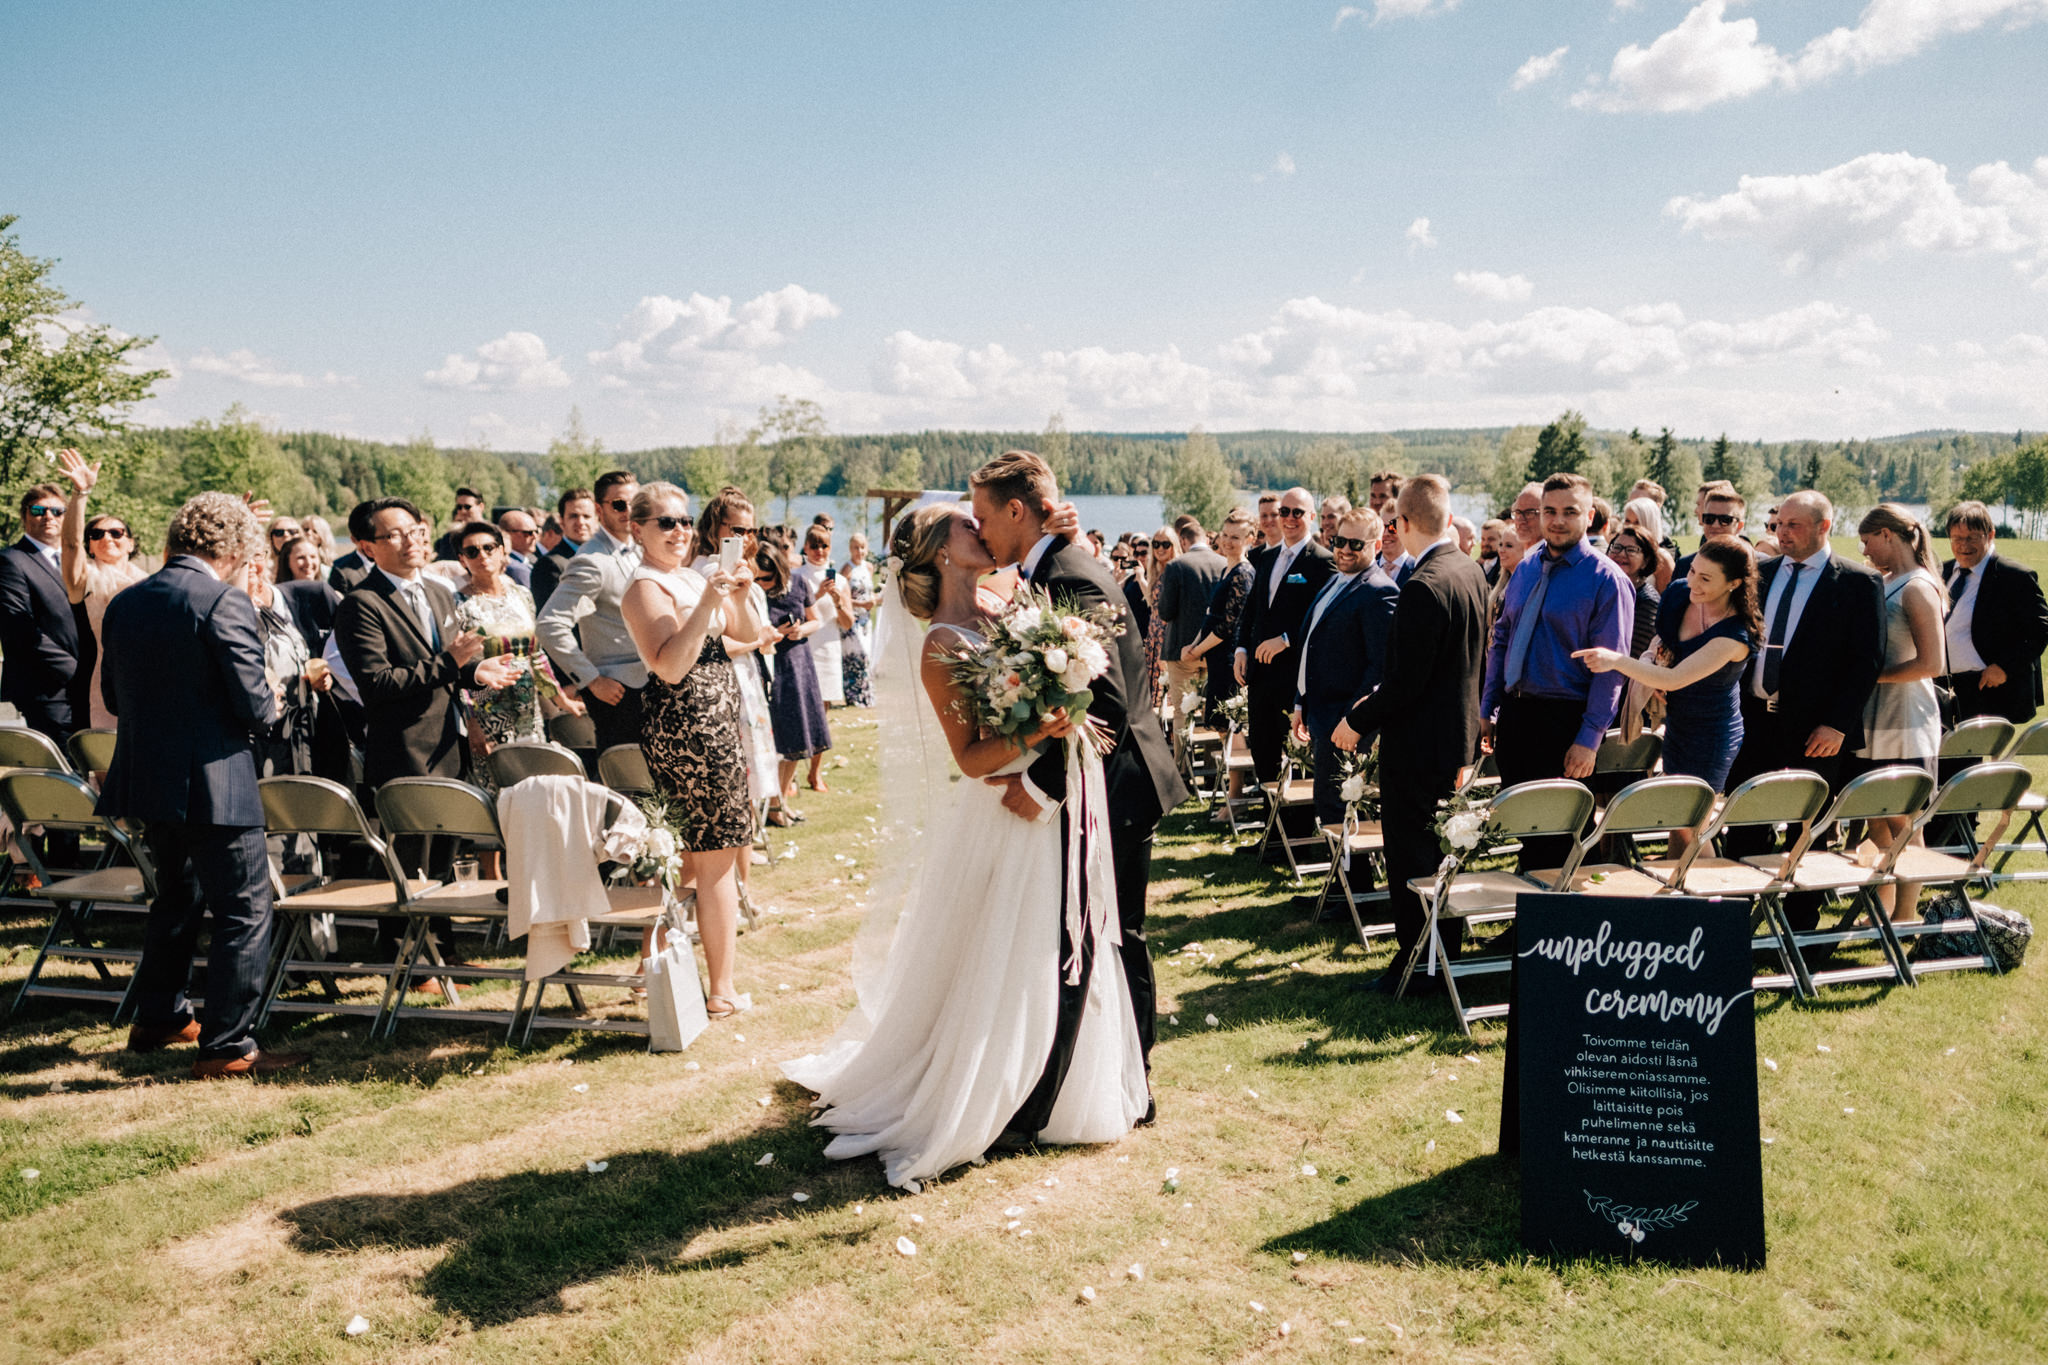 midsummer wedding in finland